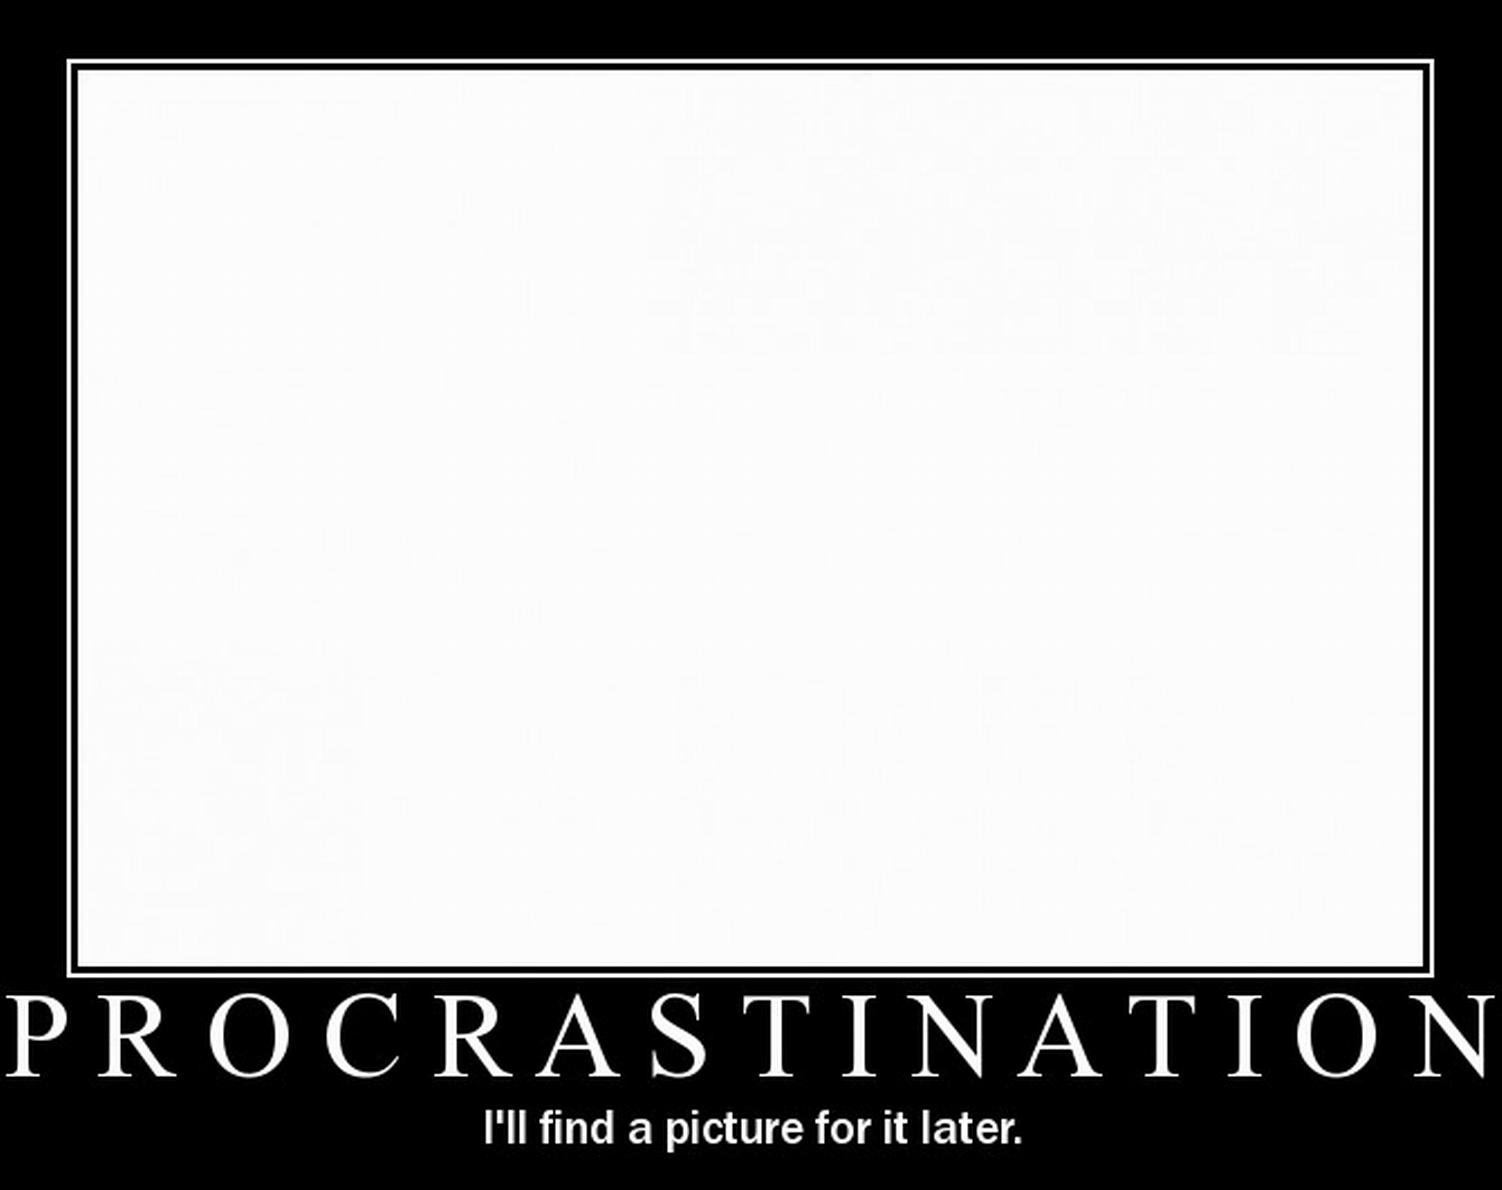 Erteleme Aliskanligi (Procrastination)